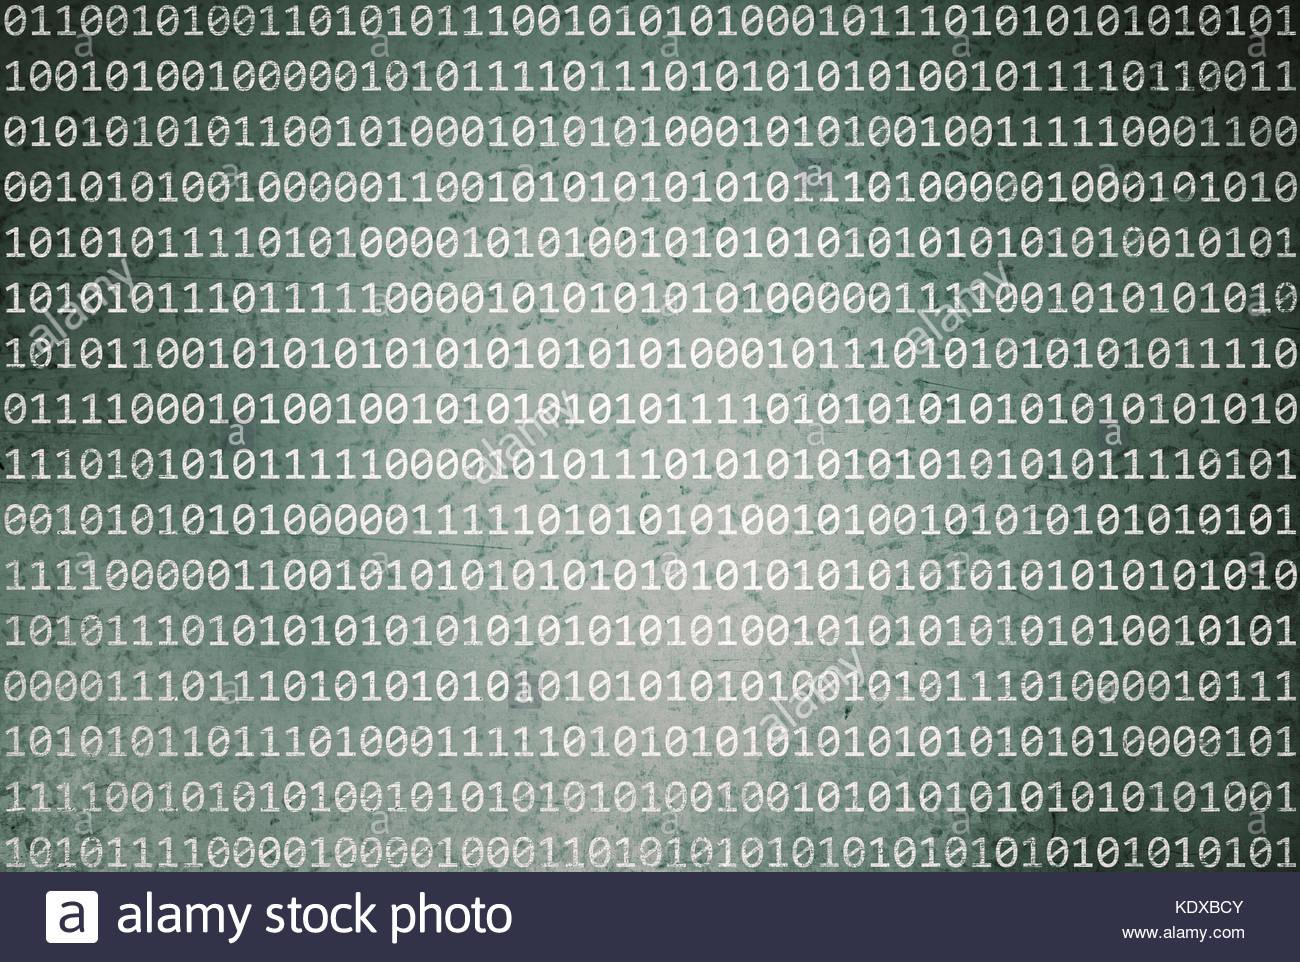 Binary Code Green Background Stockfotos & Binary Code Green ...